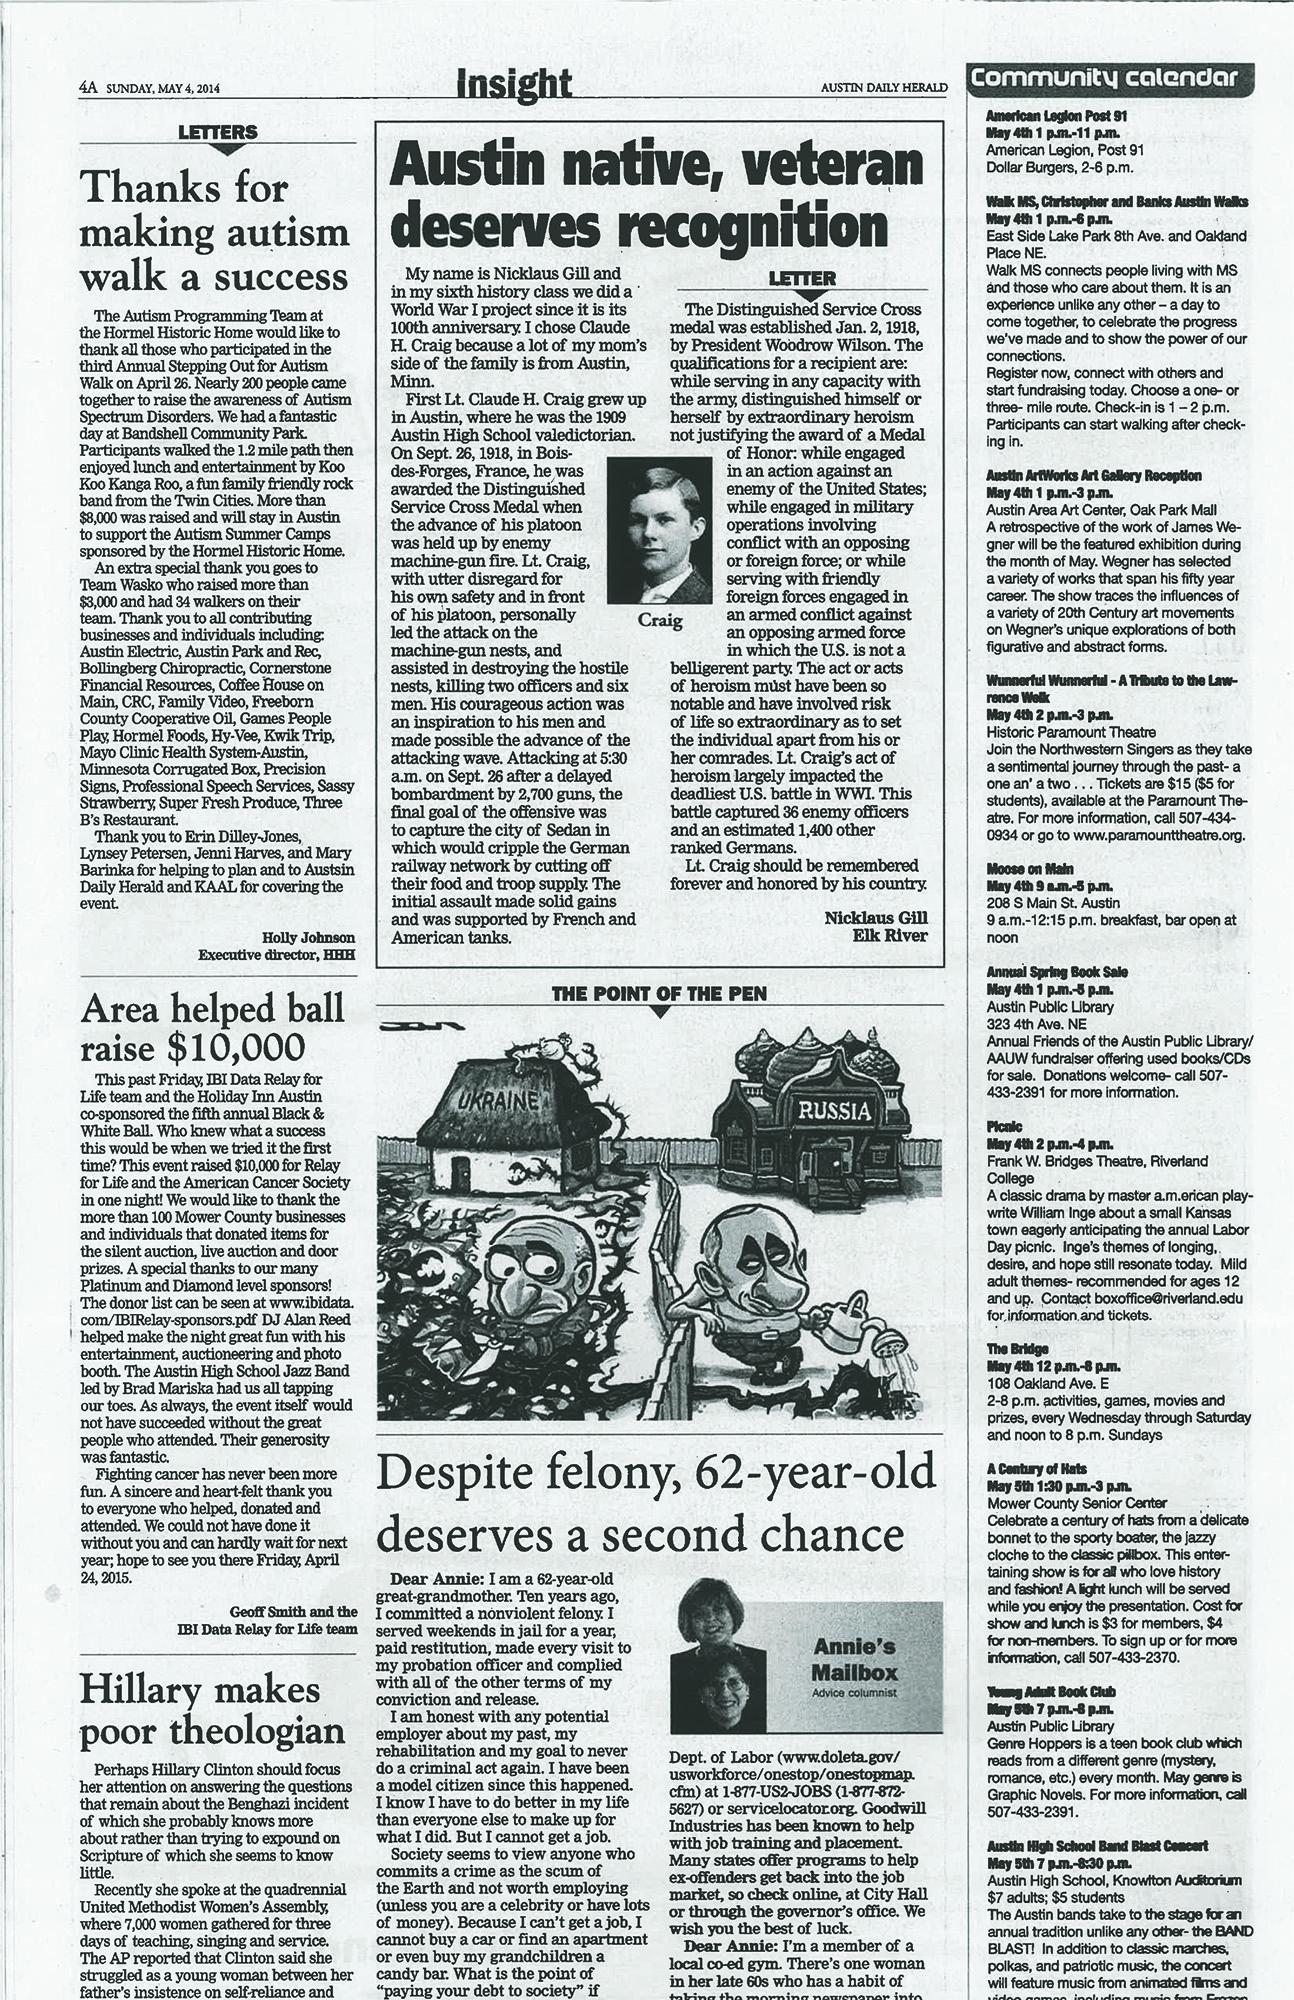 Nicklaus Gill--Austin Daily Herald (Minnesota)